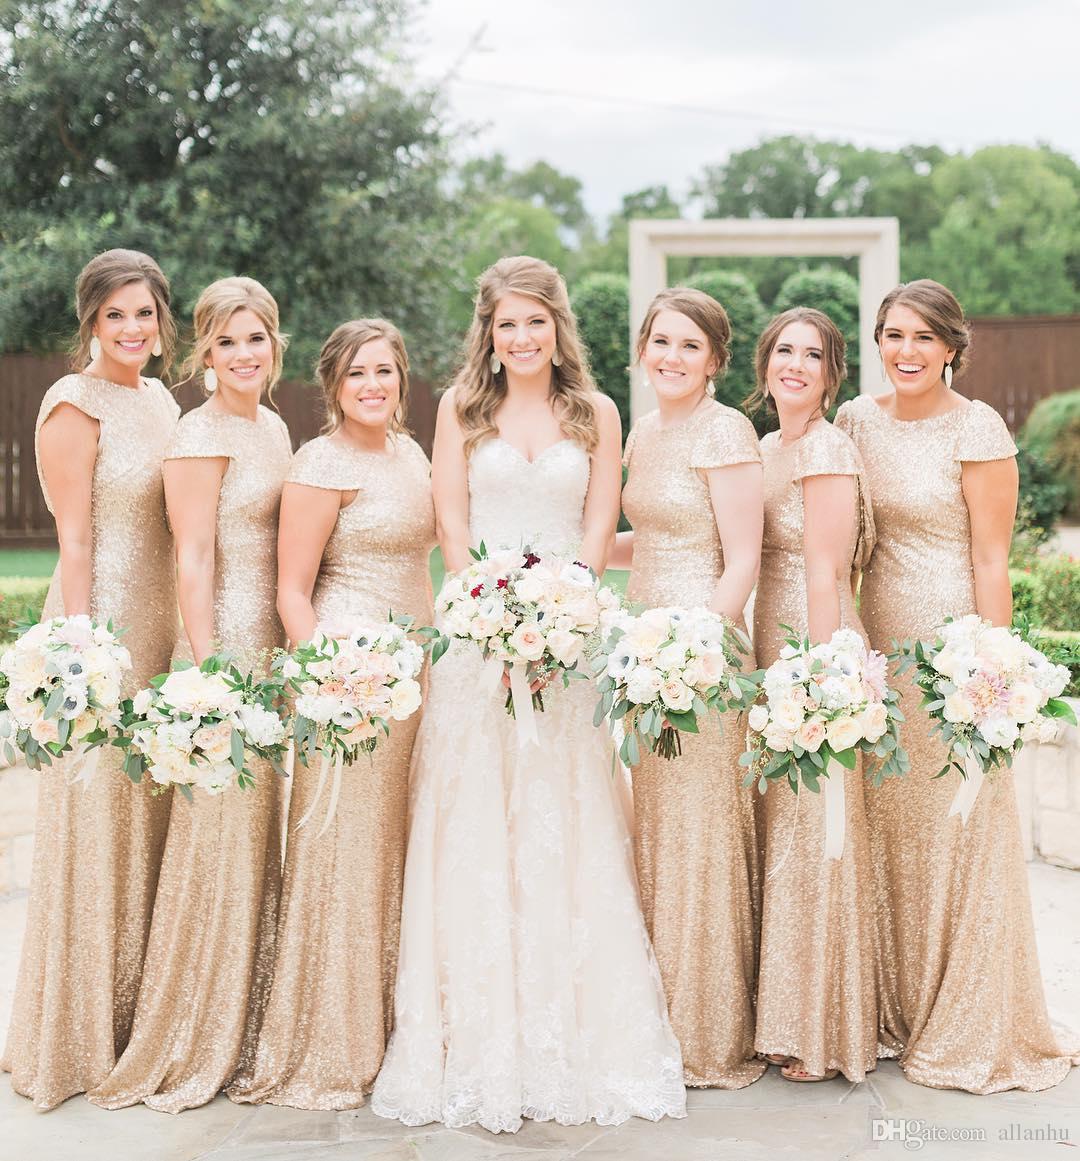 Rose Gold Mermaid Bridesmaid Dresses Jewel Neck Sequined Bling Bling Wedding  Party Gowns Maid Of Honor Dress Robes De Demoiselle D Honneur Dresses  Online ... 9e921fb53c5f